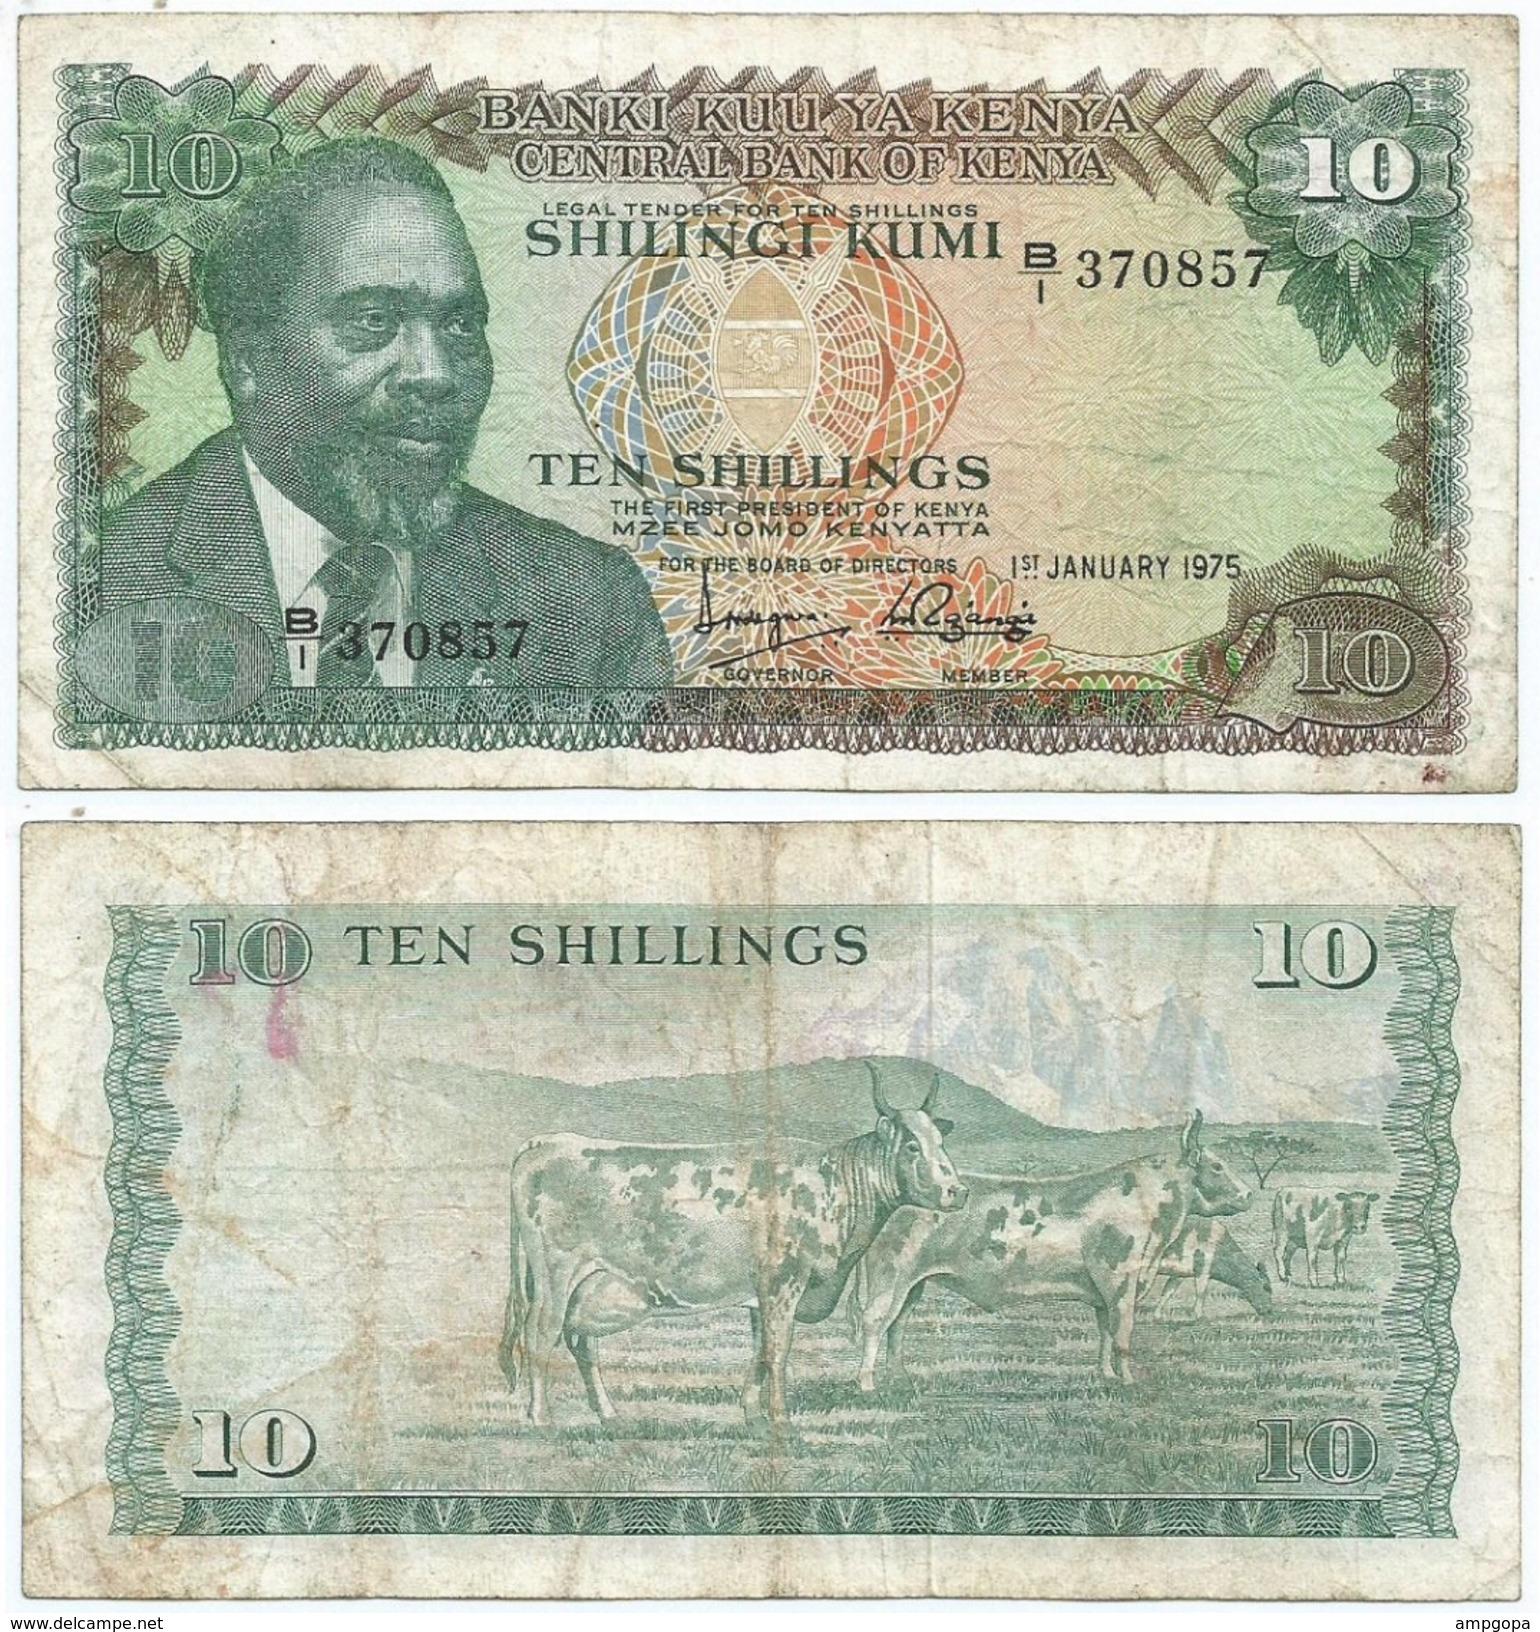 Kenia - Kenya 10 Shillings 1975 Pick 12.a Ref 282 - Kenia